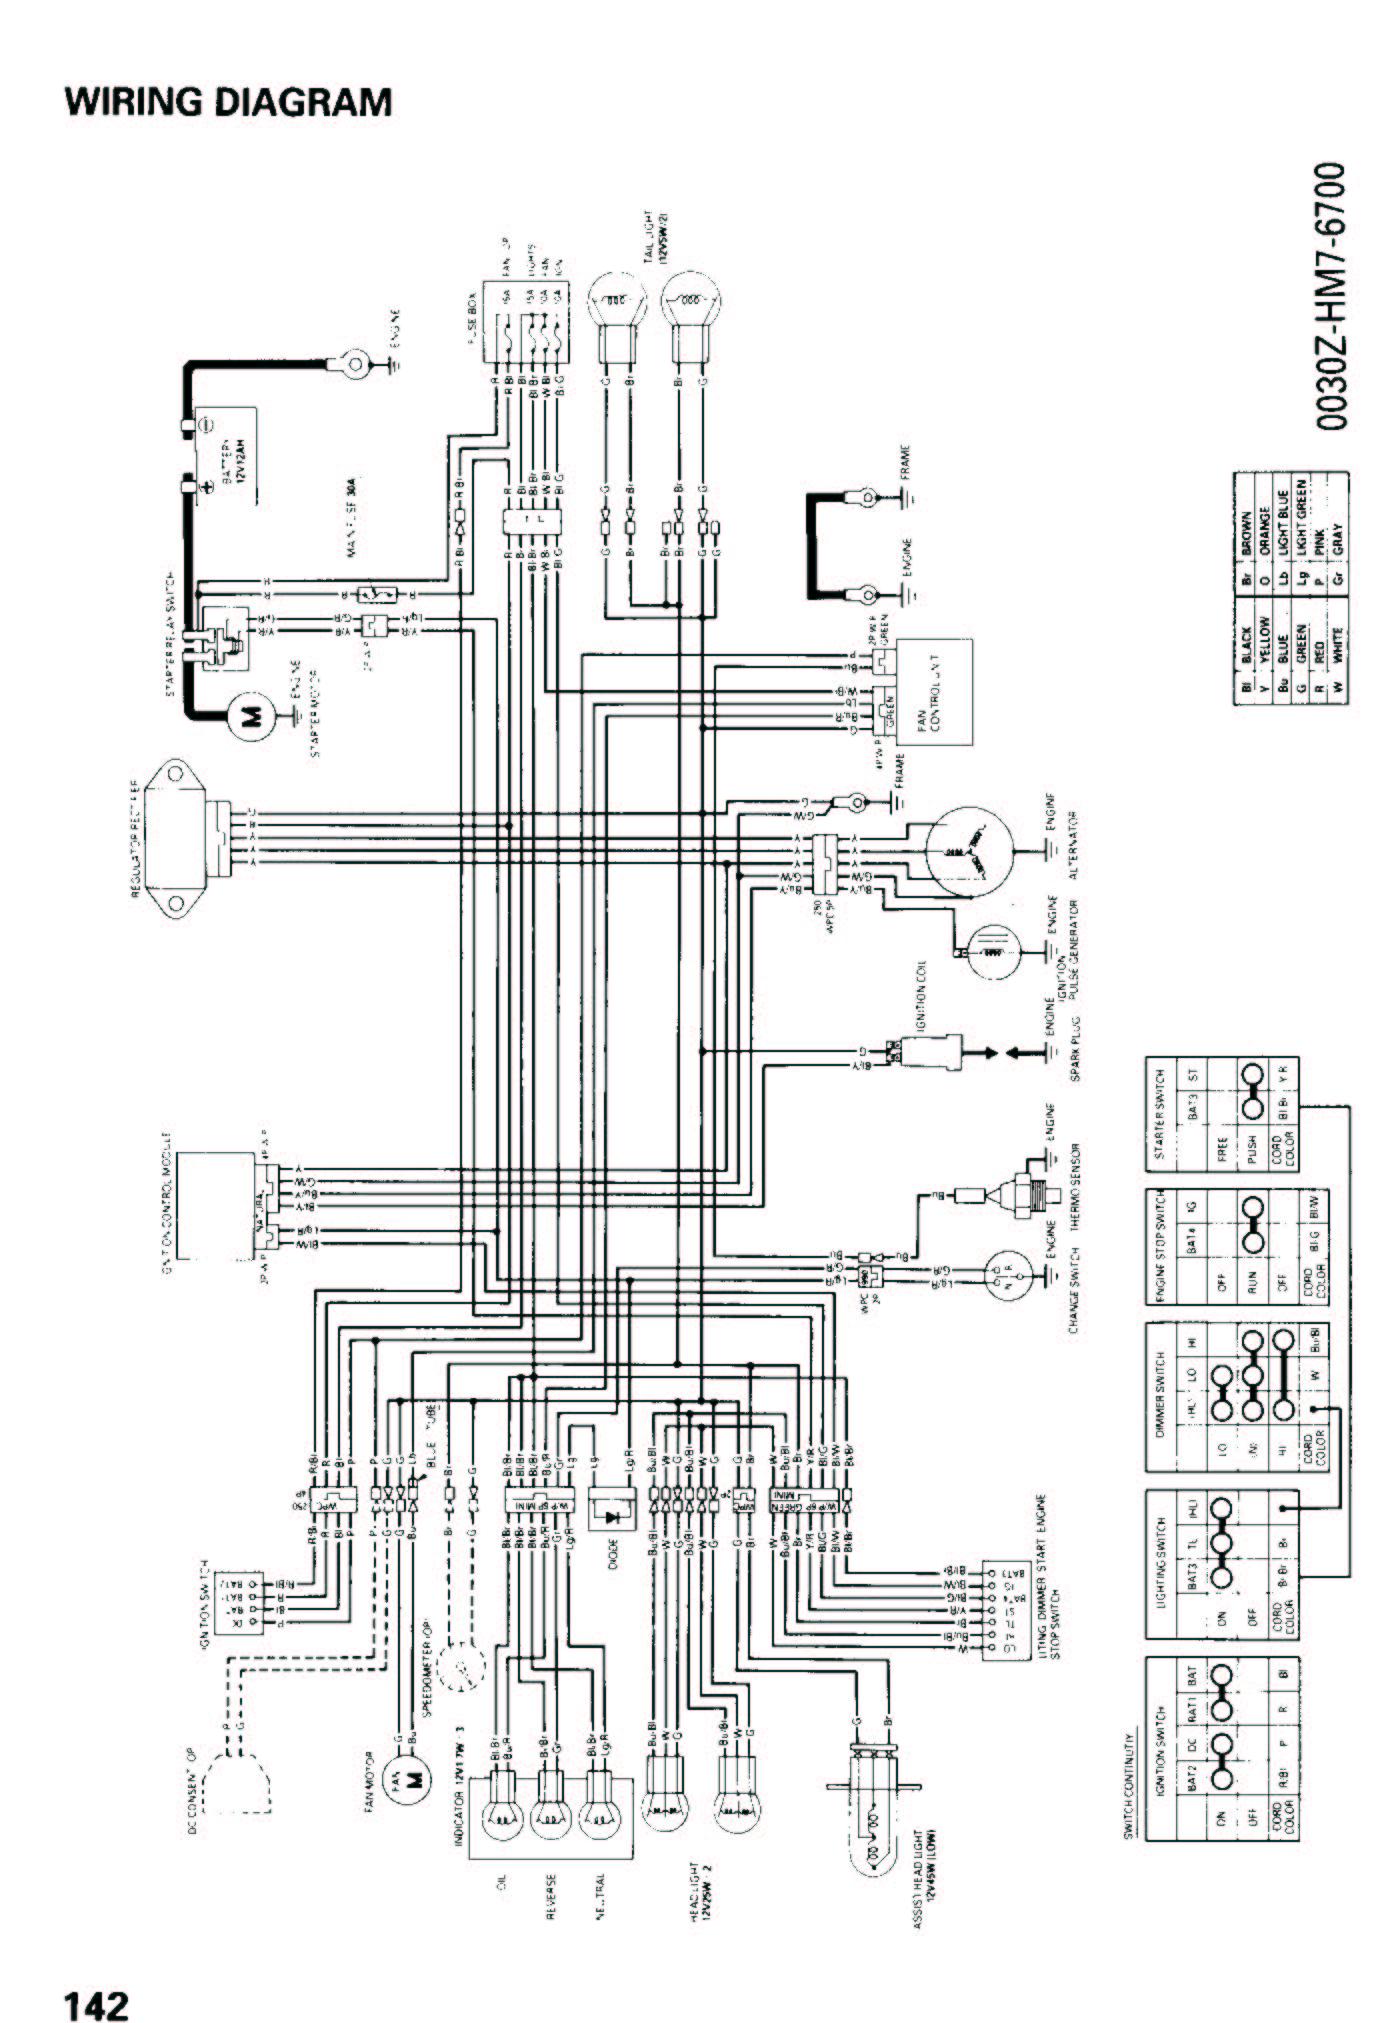 Honda Foreman 450 Wiring Diagram